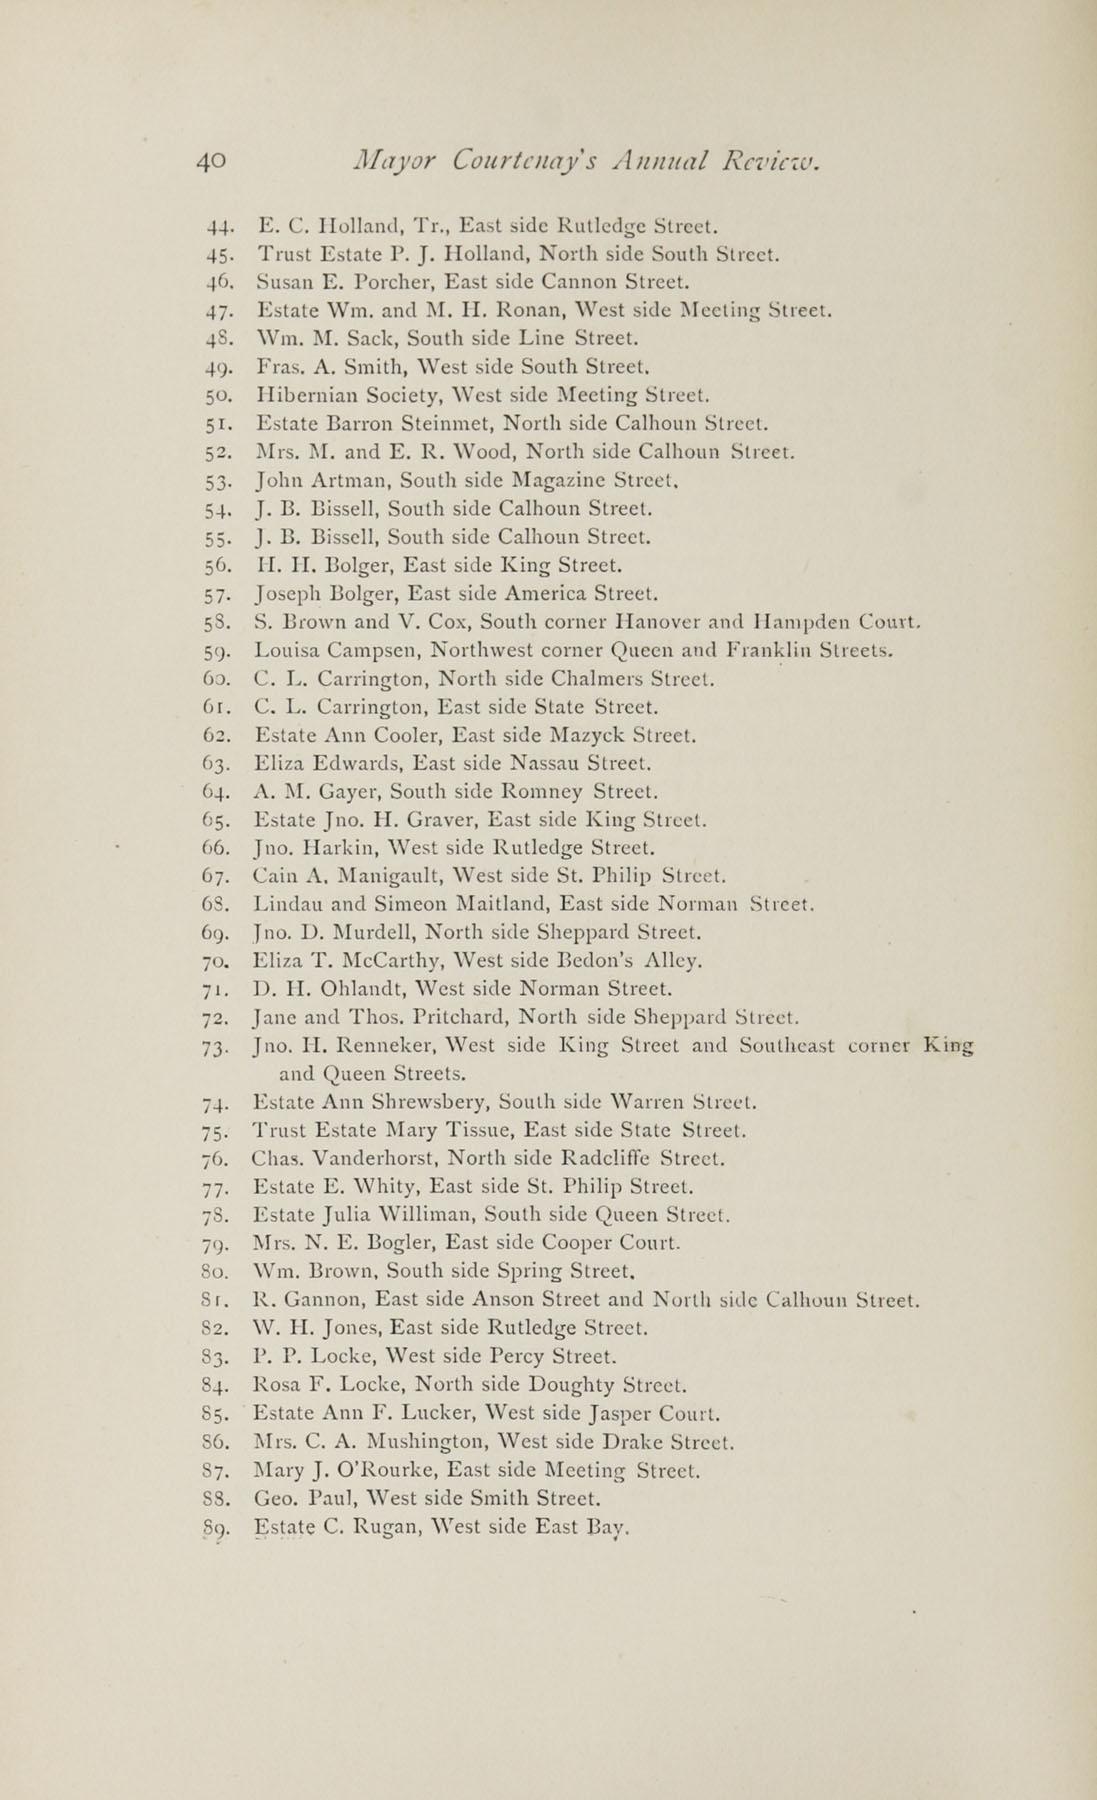 Charleston Yearbook, 1882, page 40